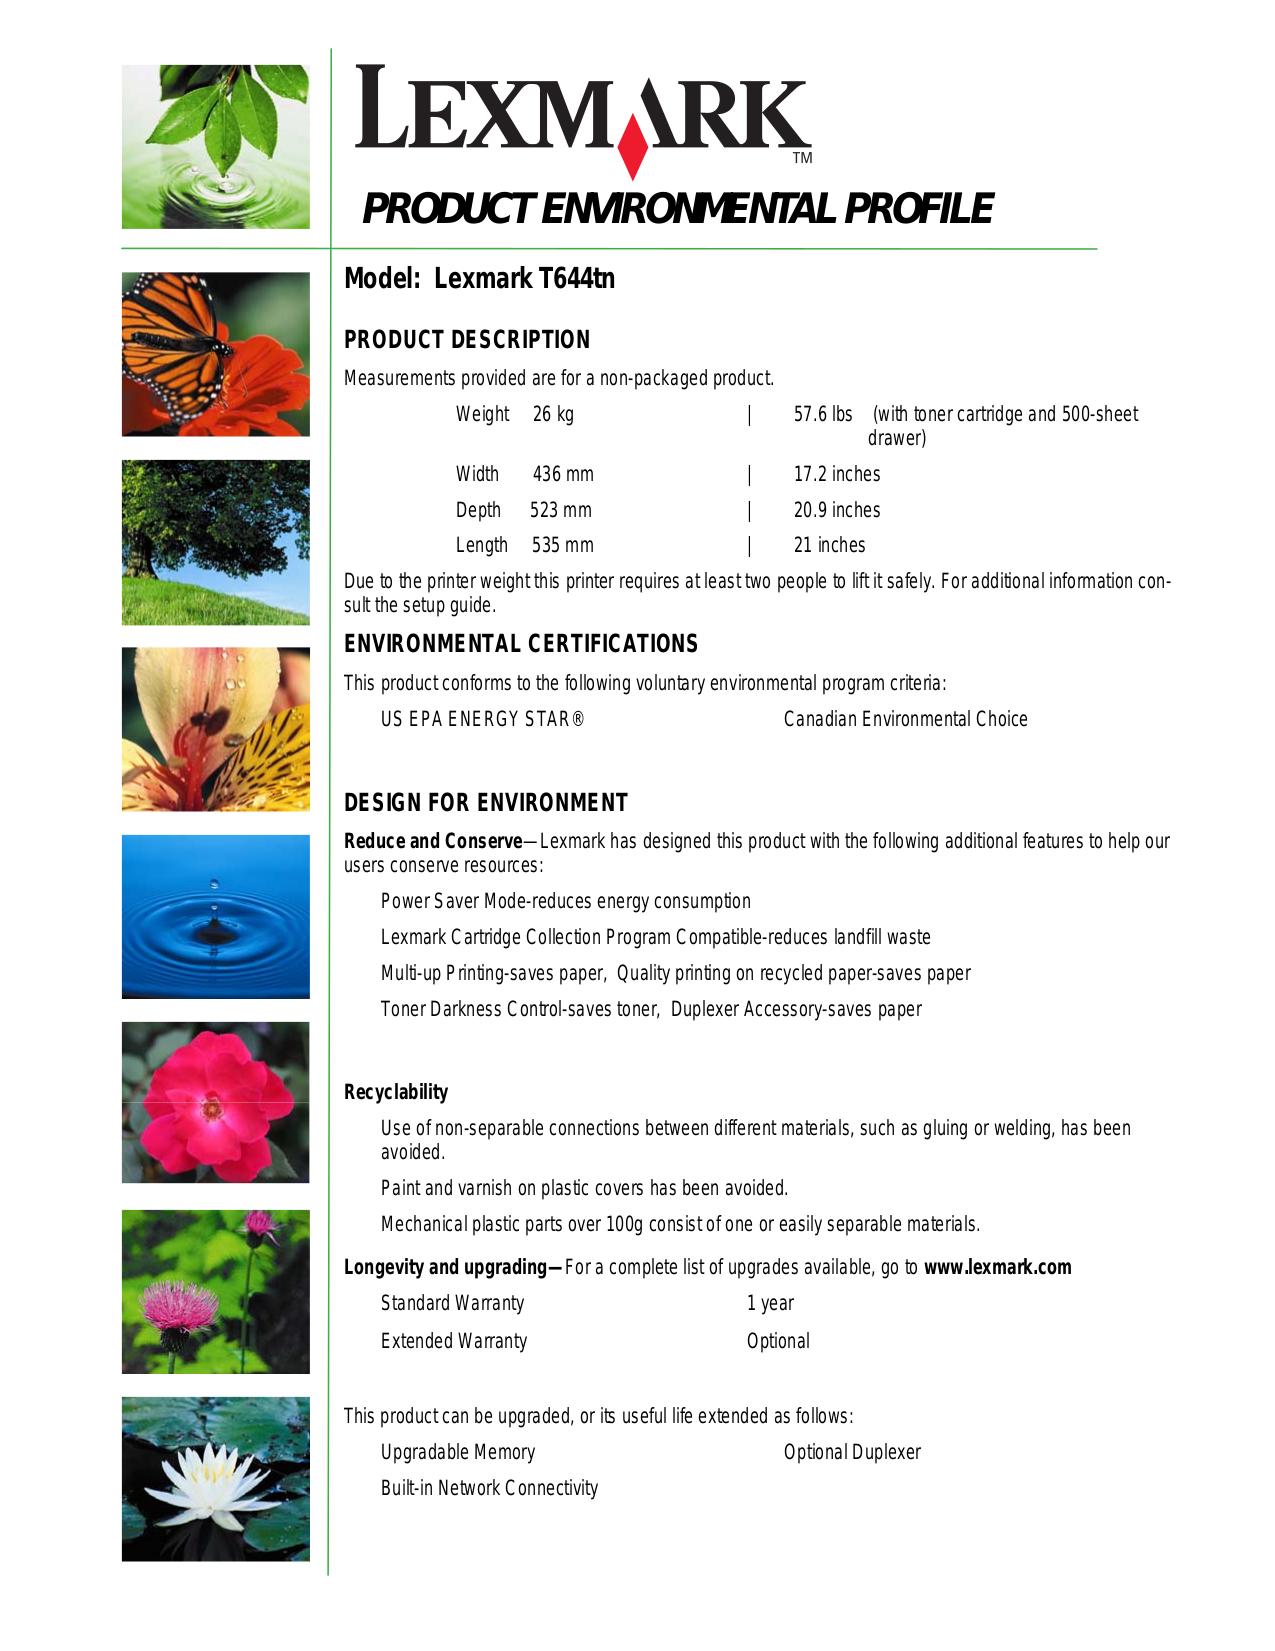 pdf for Lexmark Printer T644tn manual